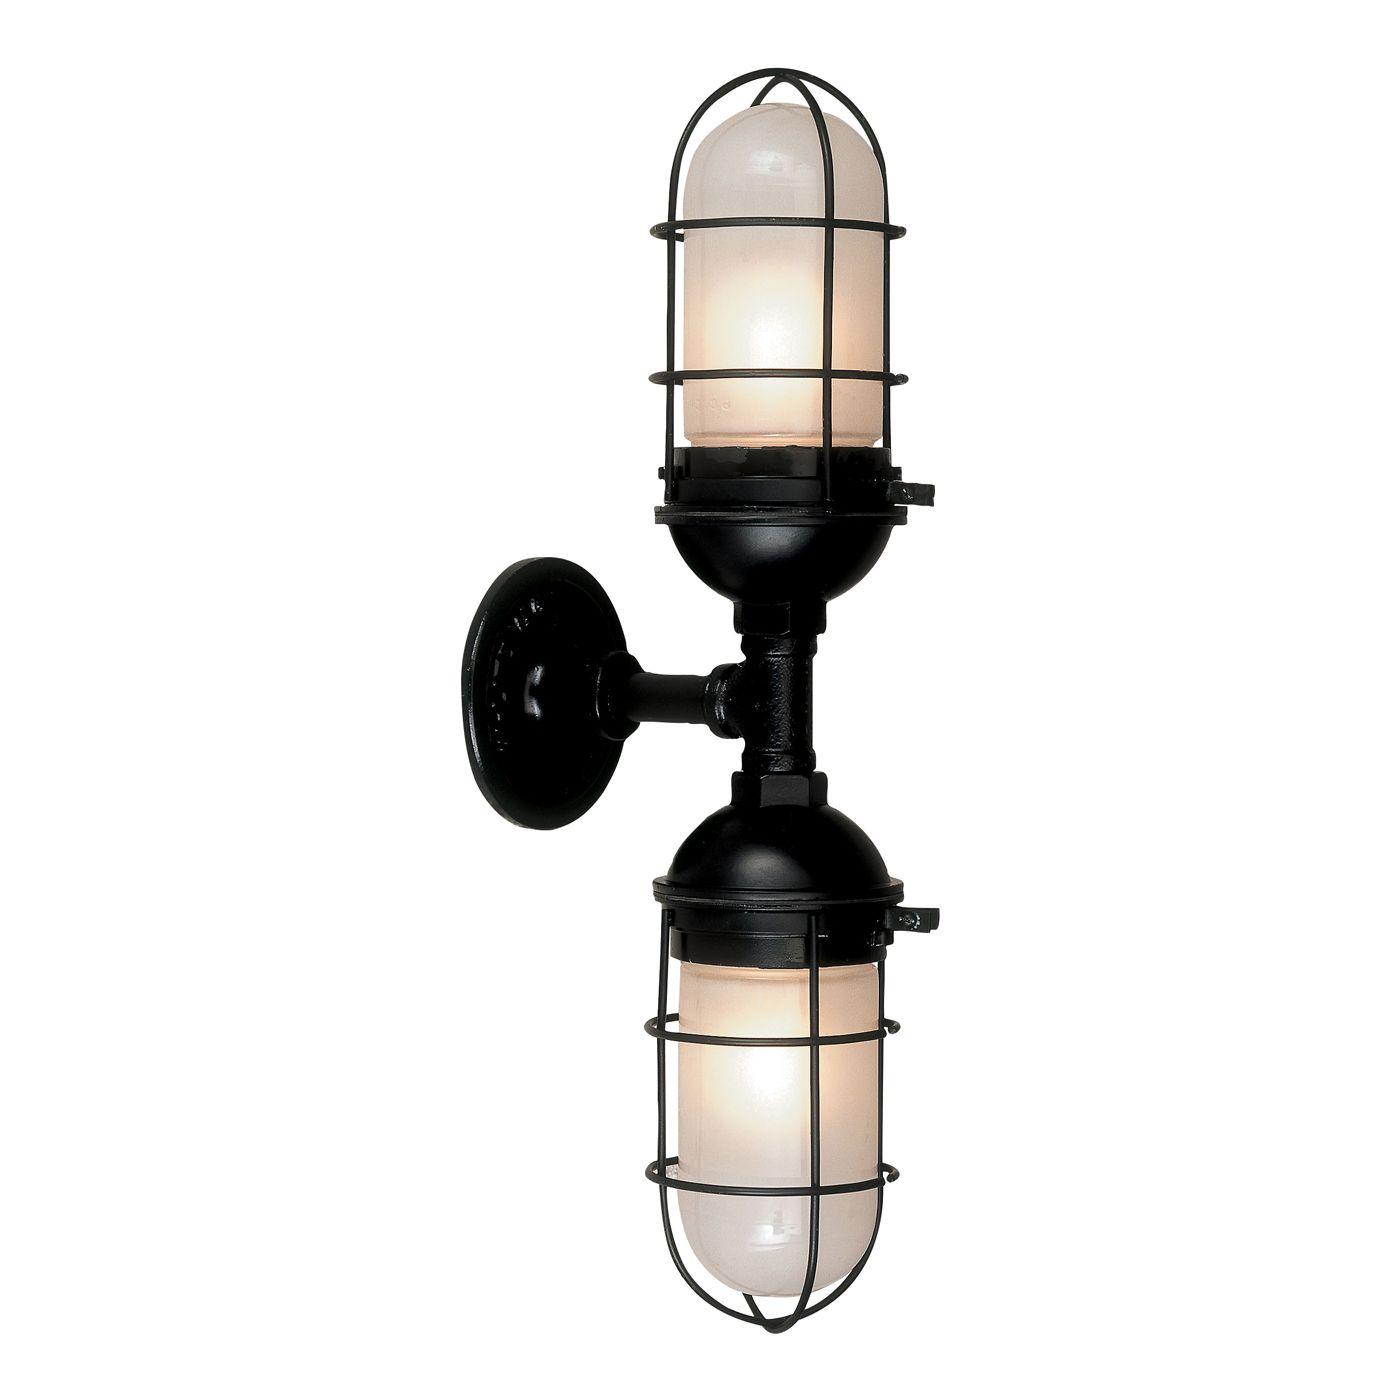 Outdoor Lighting Manufacturer Exterior lighting fixtures manufacturer lighting exterior lighting exterior lighting workwithnaturefo